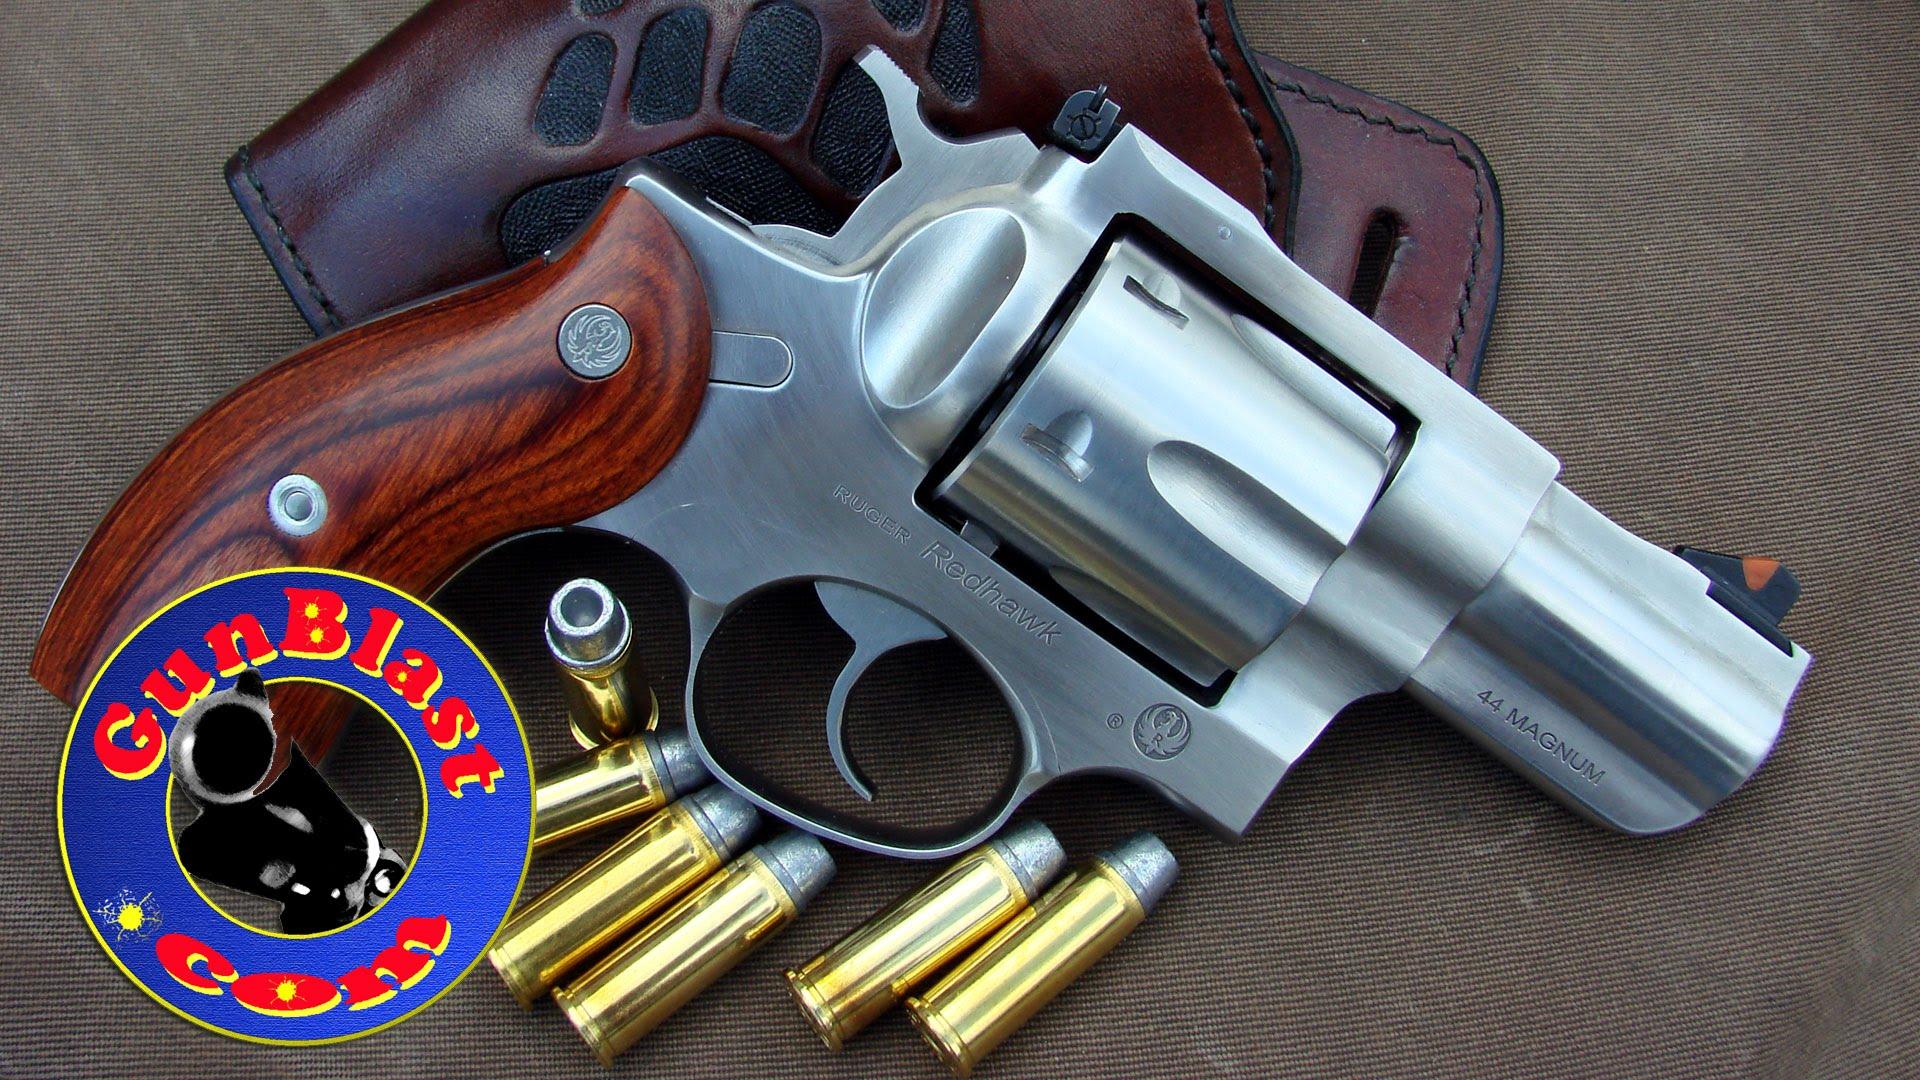 TALO Exclusive Ruger Redhawk 44 Magnum Revolver